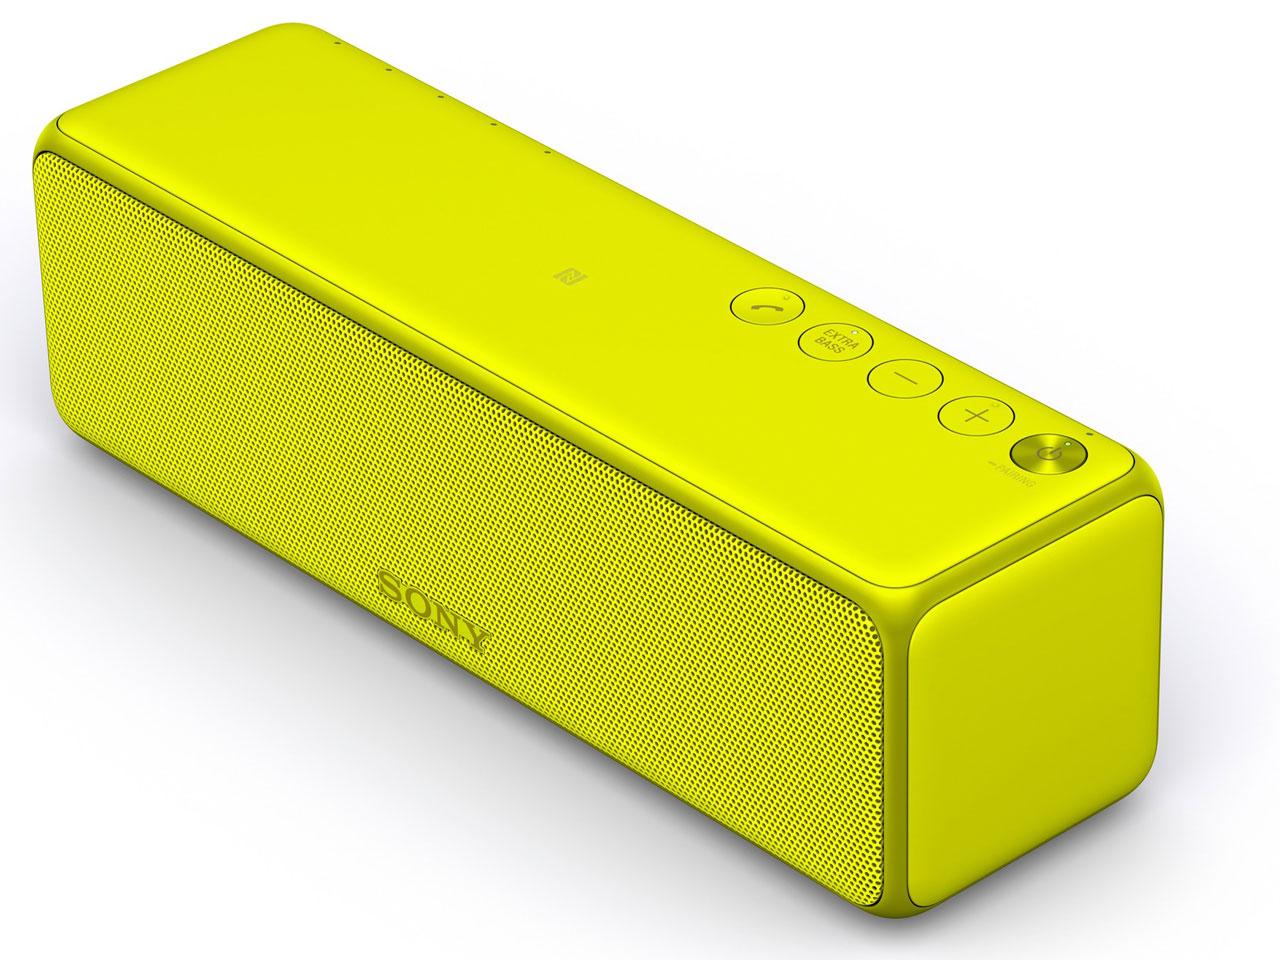 SONY ハイレゾ対応 ワイヤレスポータブルスピーカー SRS-HG1(Y) 【新品】【送料無料】